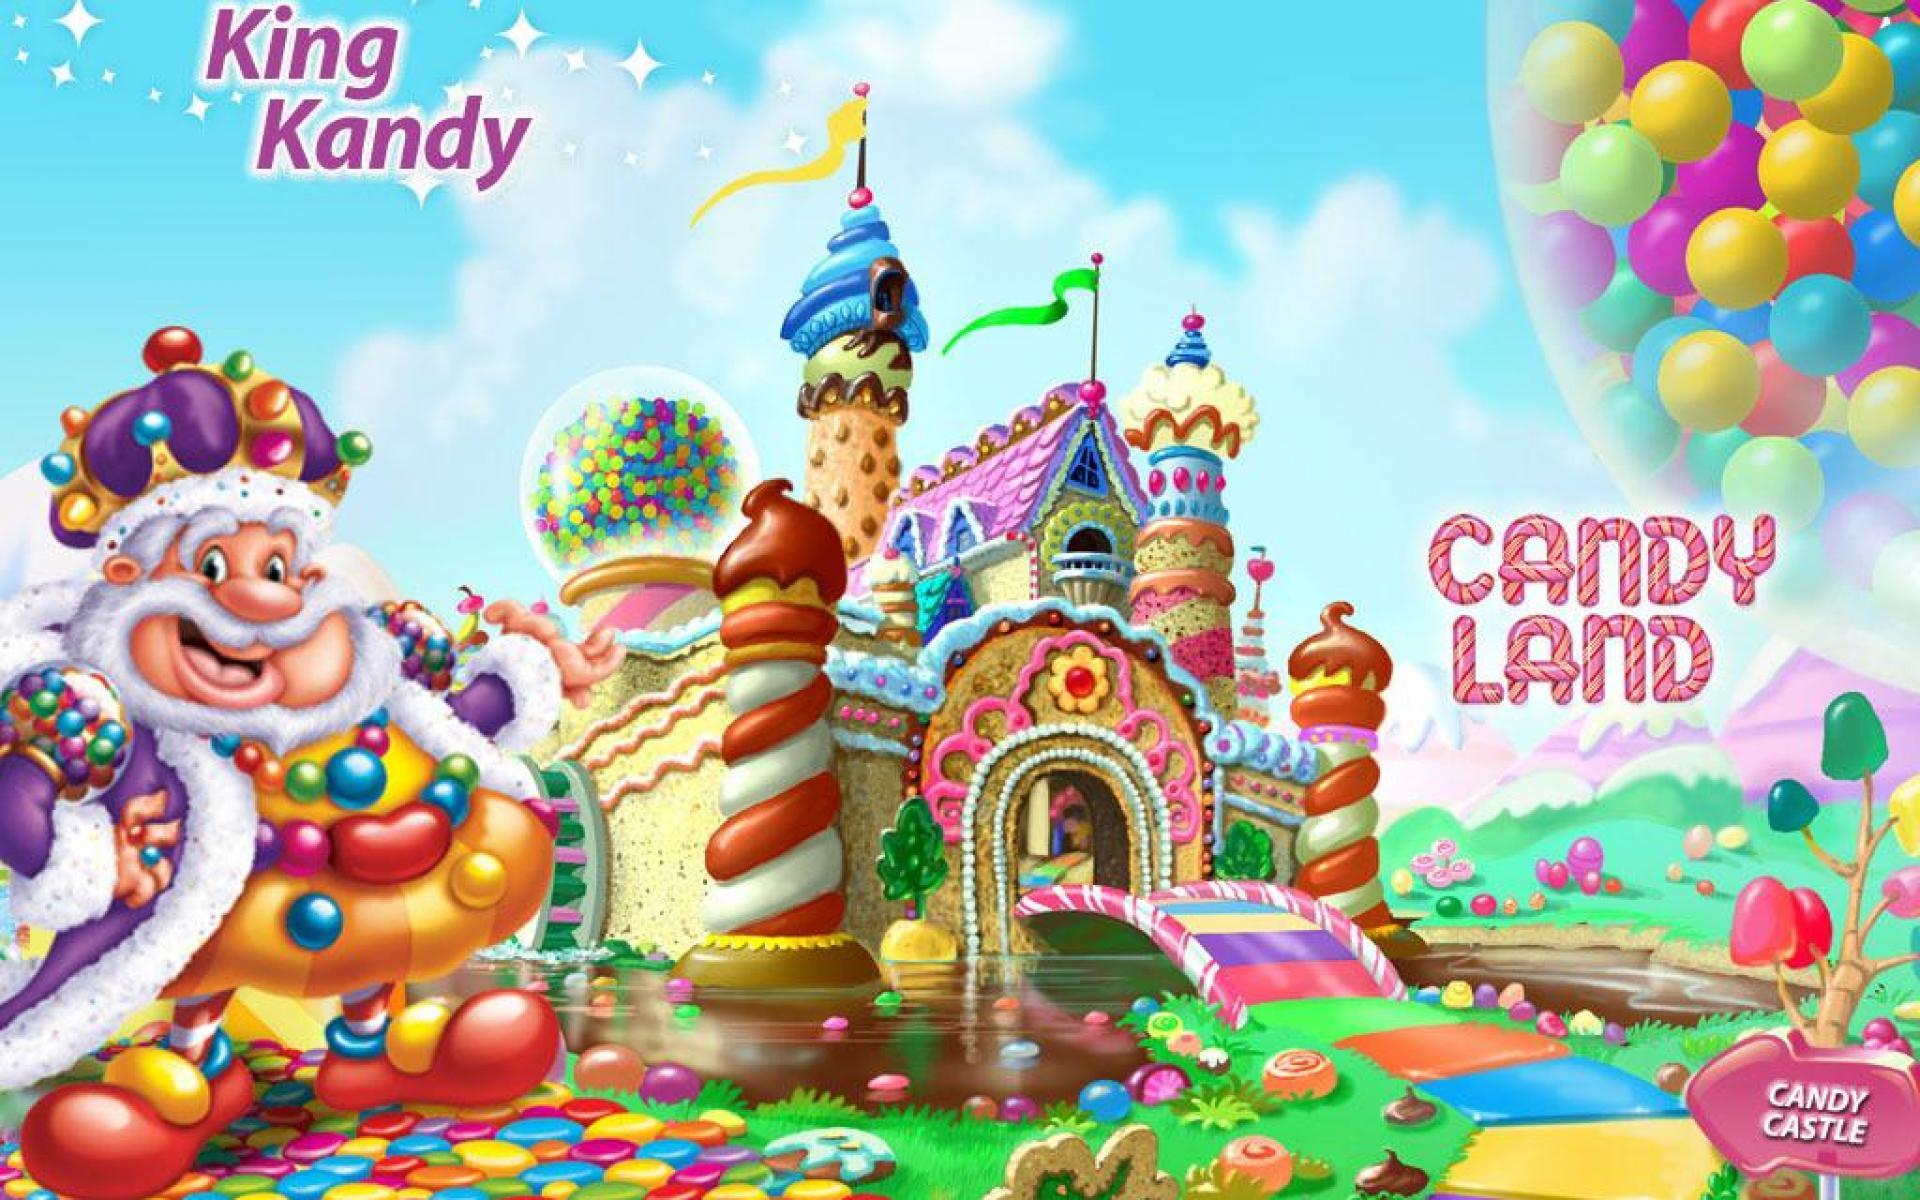 Christmas Candyland Backdrop.46 Candyland Wallpaper Hd On Wallpapersafari